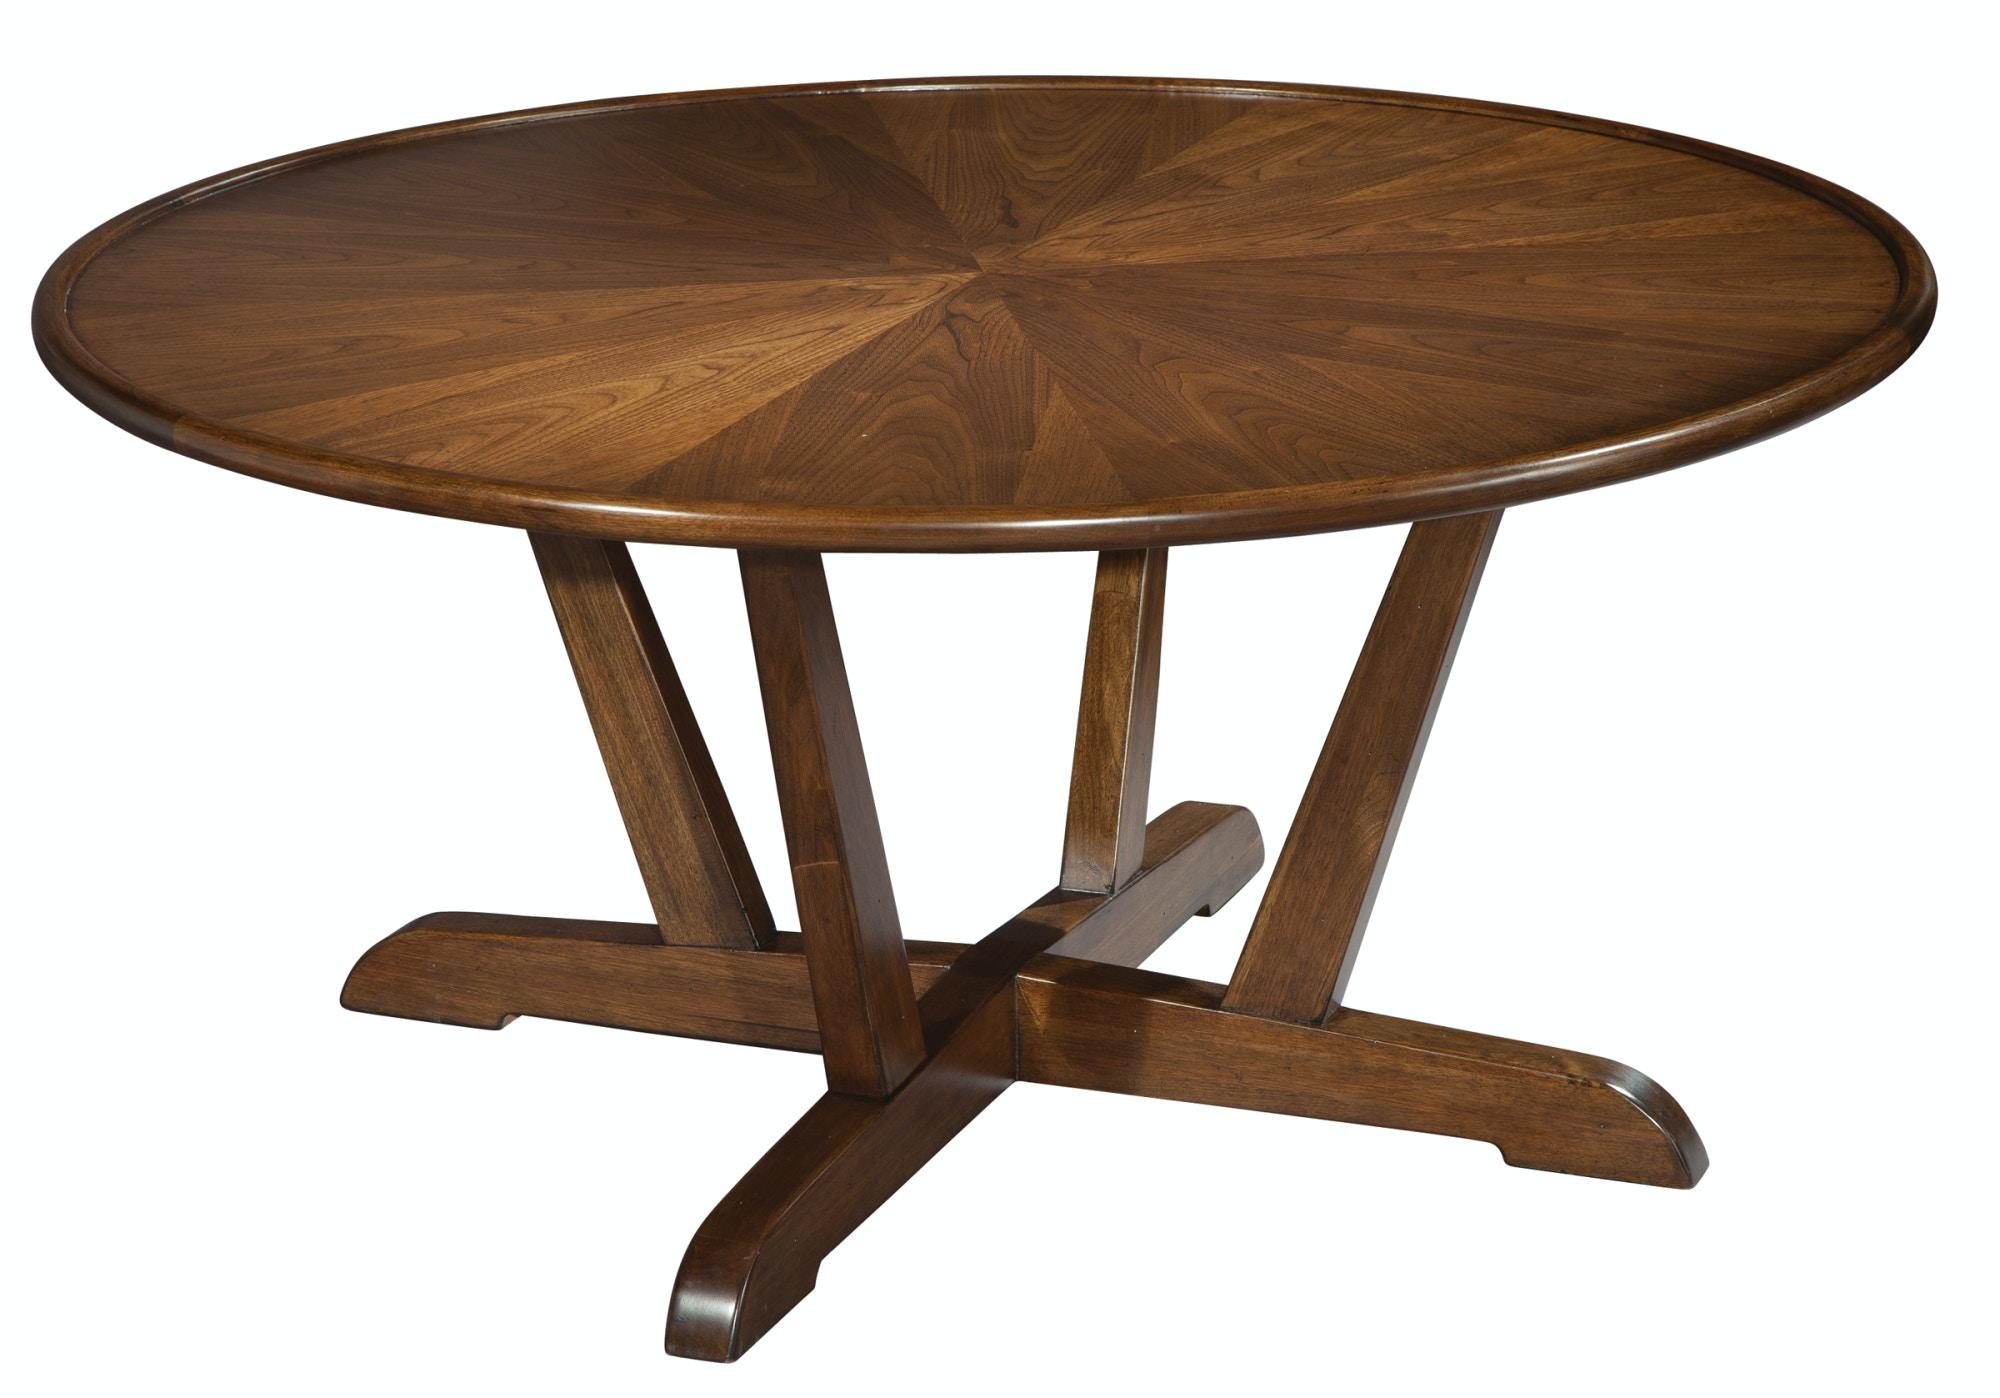 Hekman Furniture Mid Century Modern Occasional Round Coffee Table 951302MW  Hekman